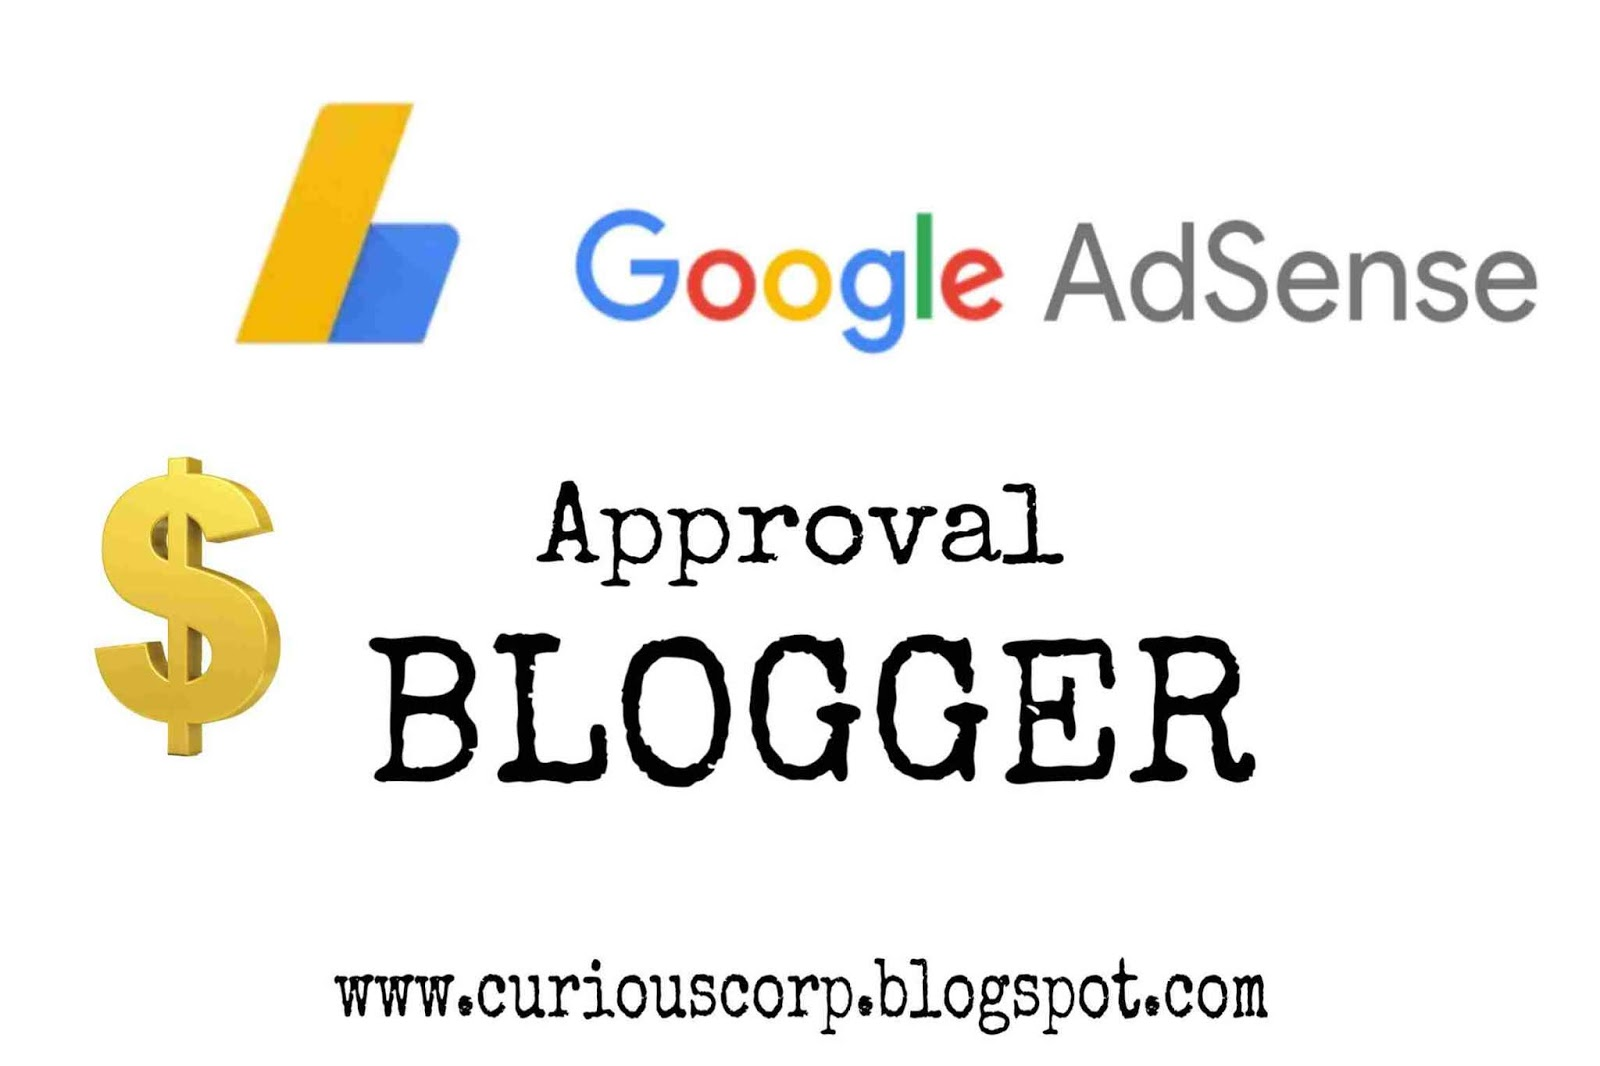 Adsense approval blogger blogspot